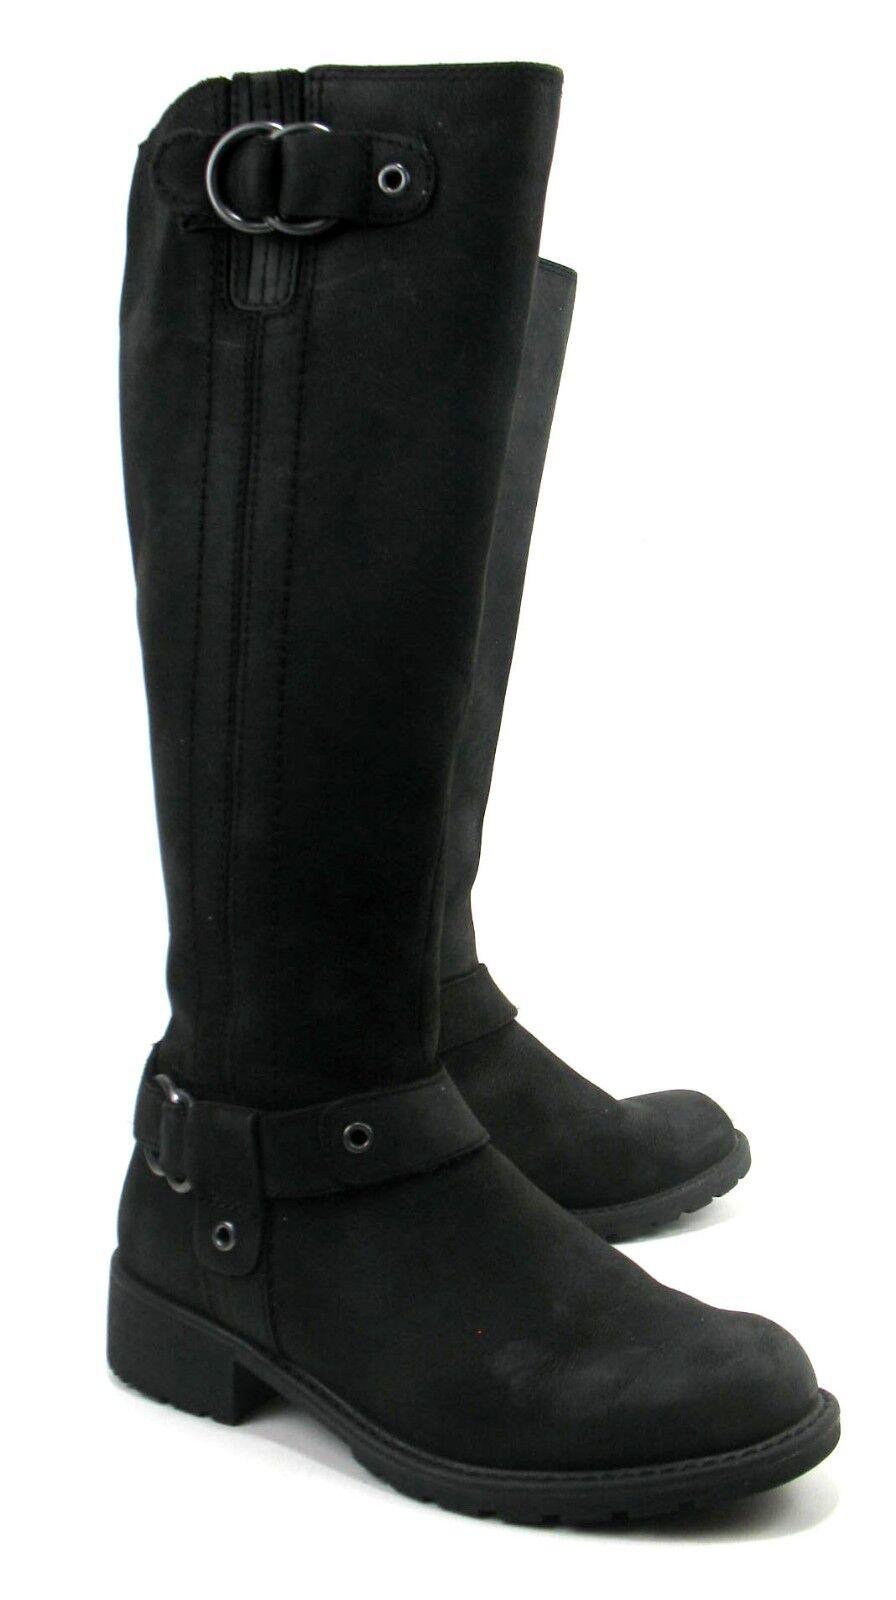 Clarks - Soft Black Leather Knee High Boots - Tige De Cuir - Women's Size 6 M